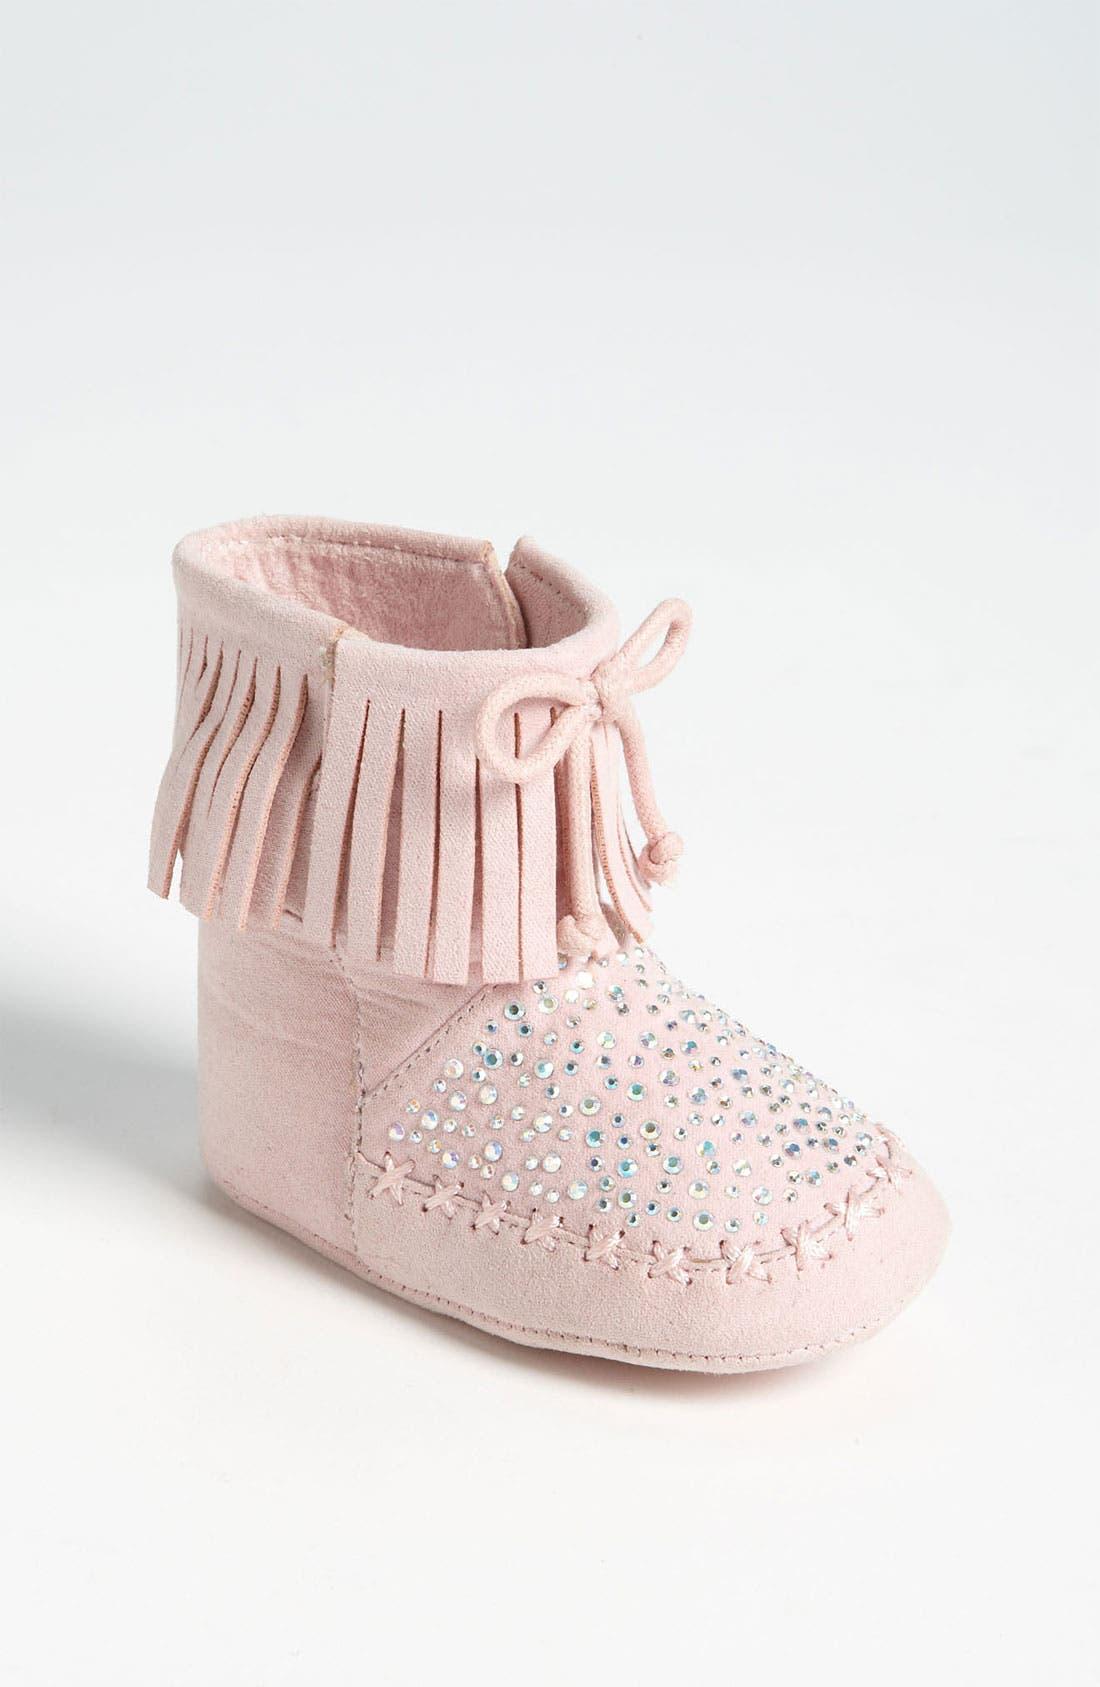 Alternate Image 1 Selected - Stuart Weitzman 'Baby Moctail' Crib Shoe (Baby)